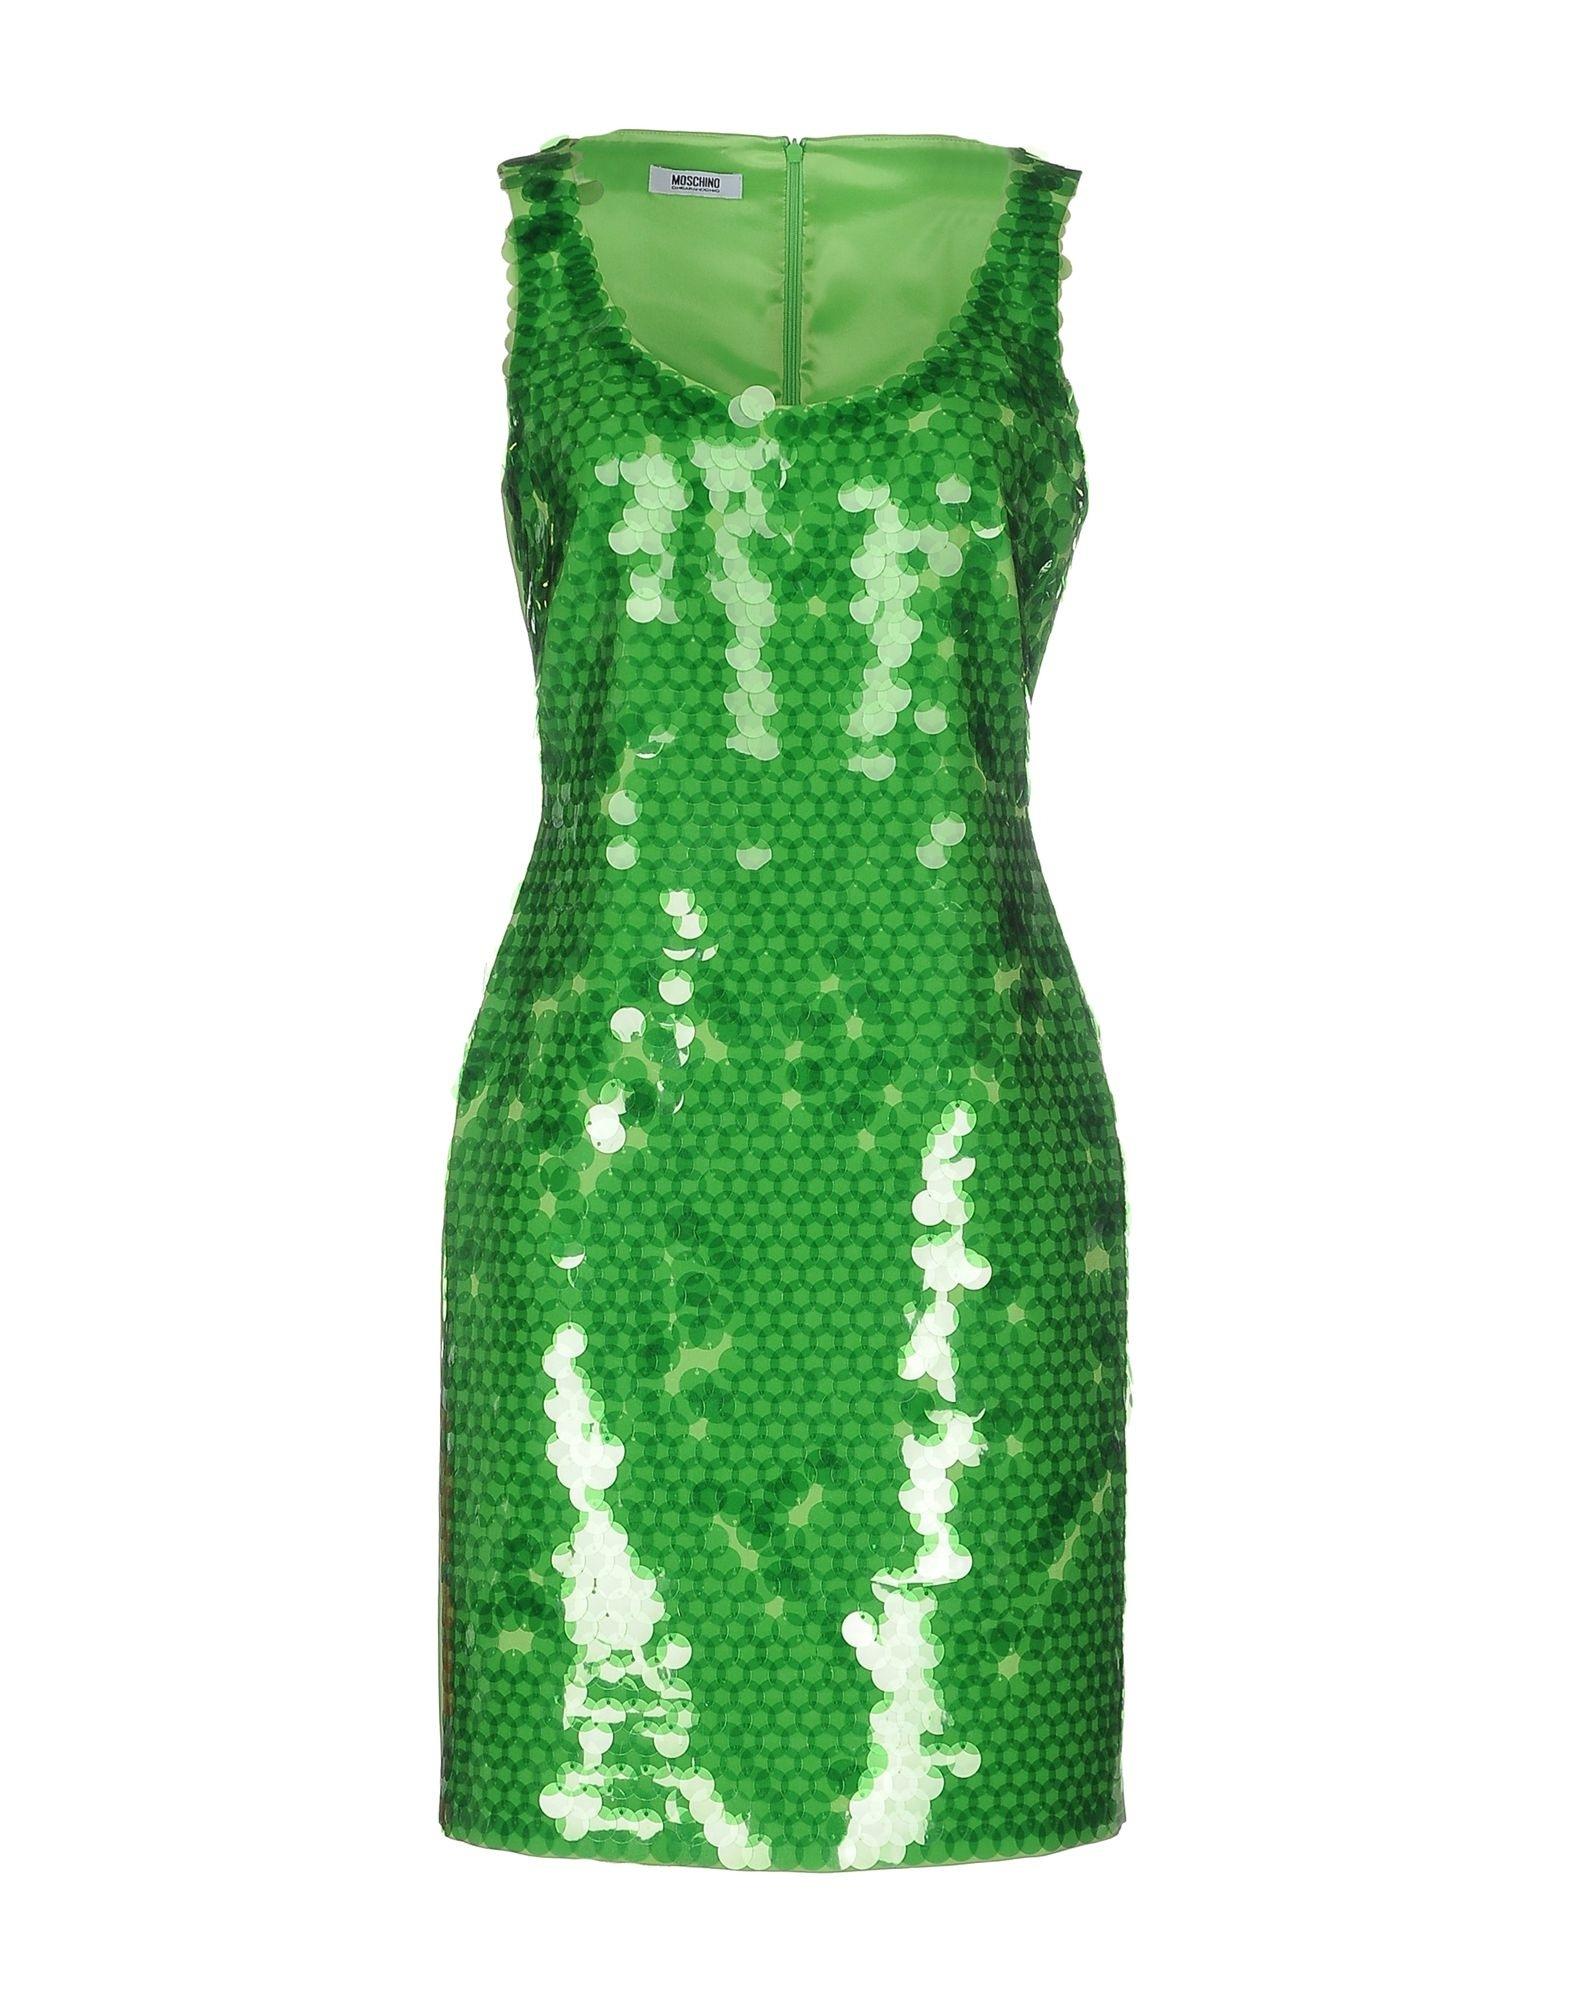 Formal Perfekt Damen Kleid Grün ÄrmelAbend Großartig Damen Kleid Grün Spezialgebiet